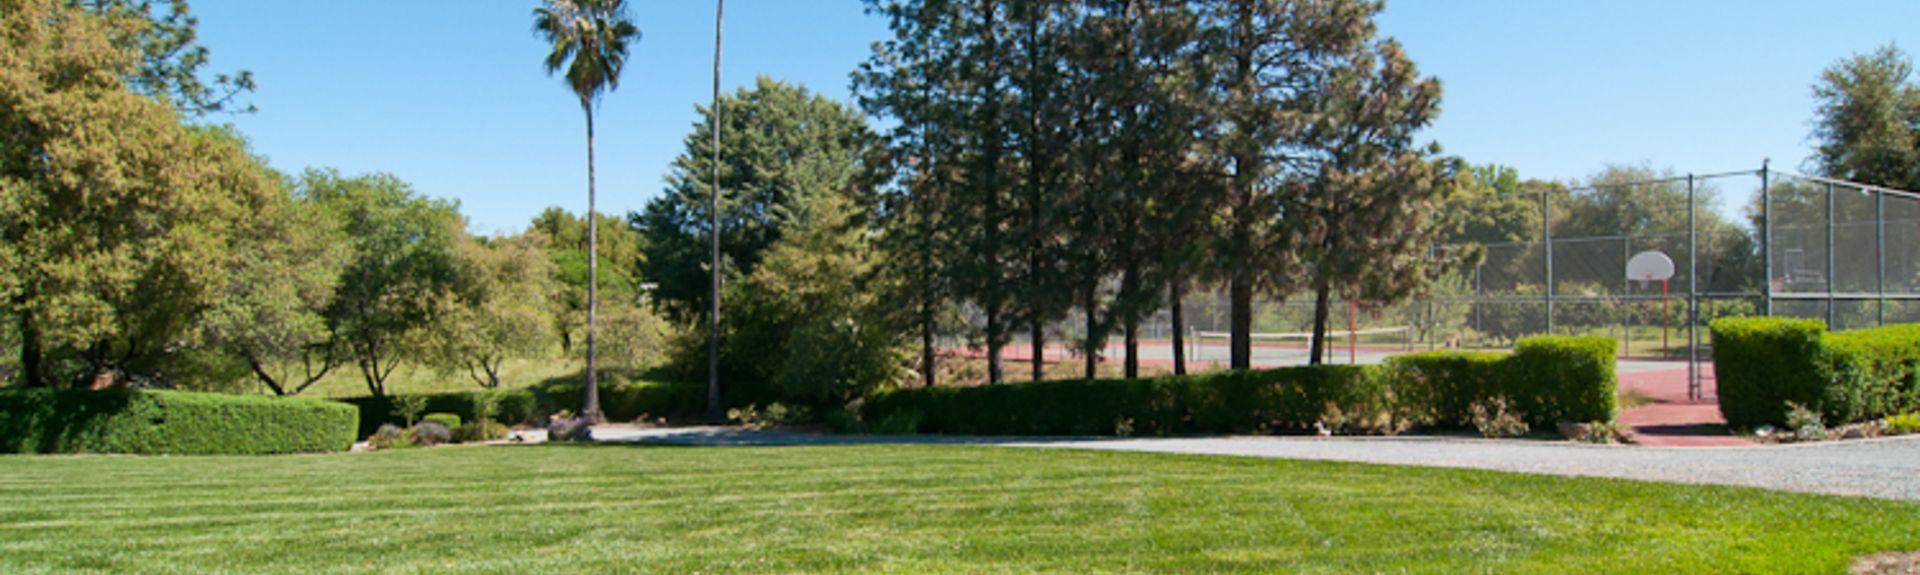 Meadow Vista Park, Colfax, CA, USA